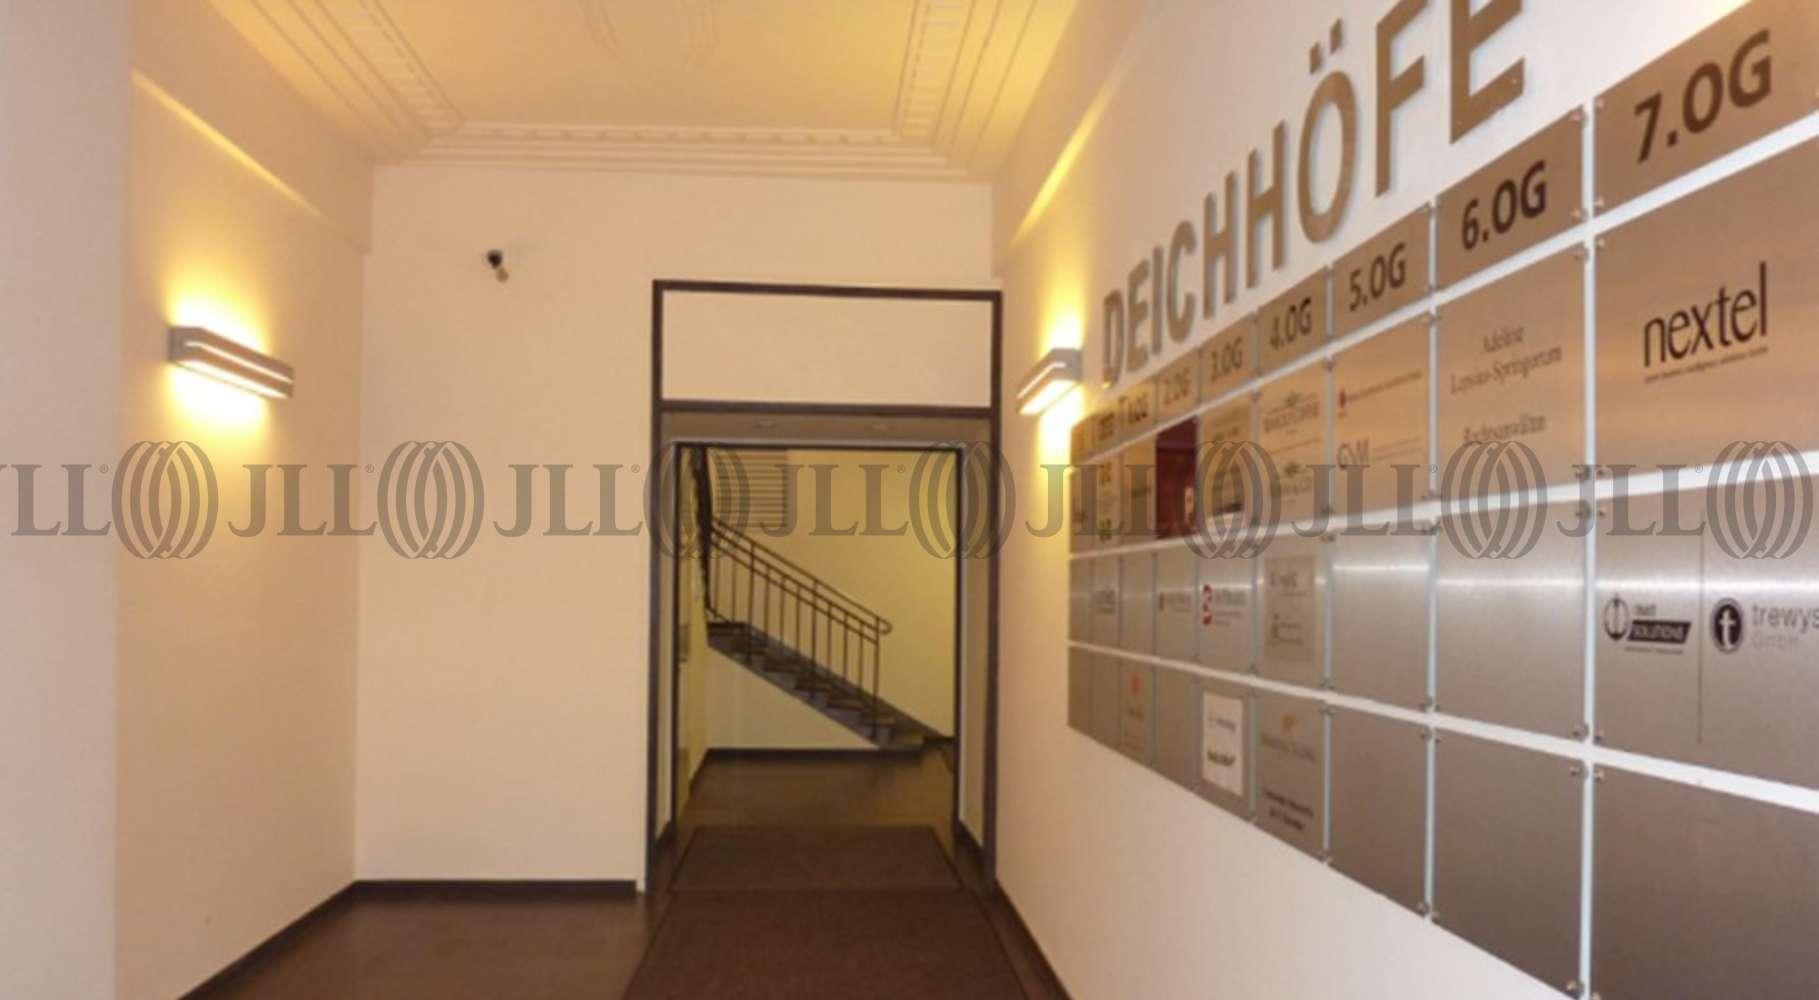 Büros Hamburg, 20459 - Büro - Hamburg, Altstadt - H0496 - 9409457